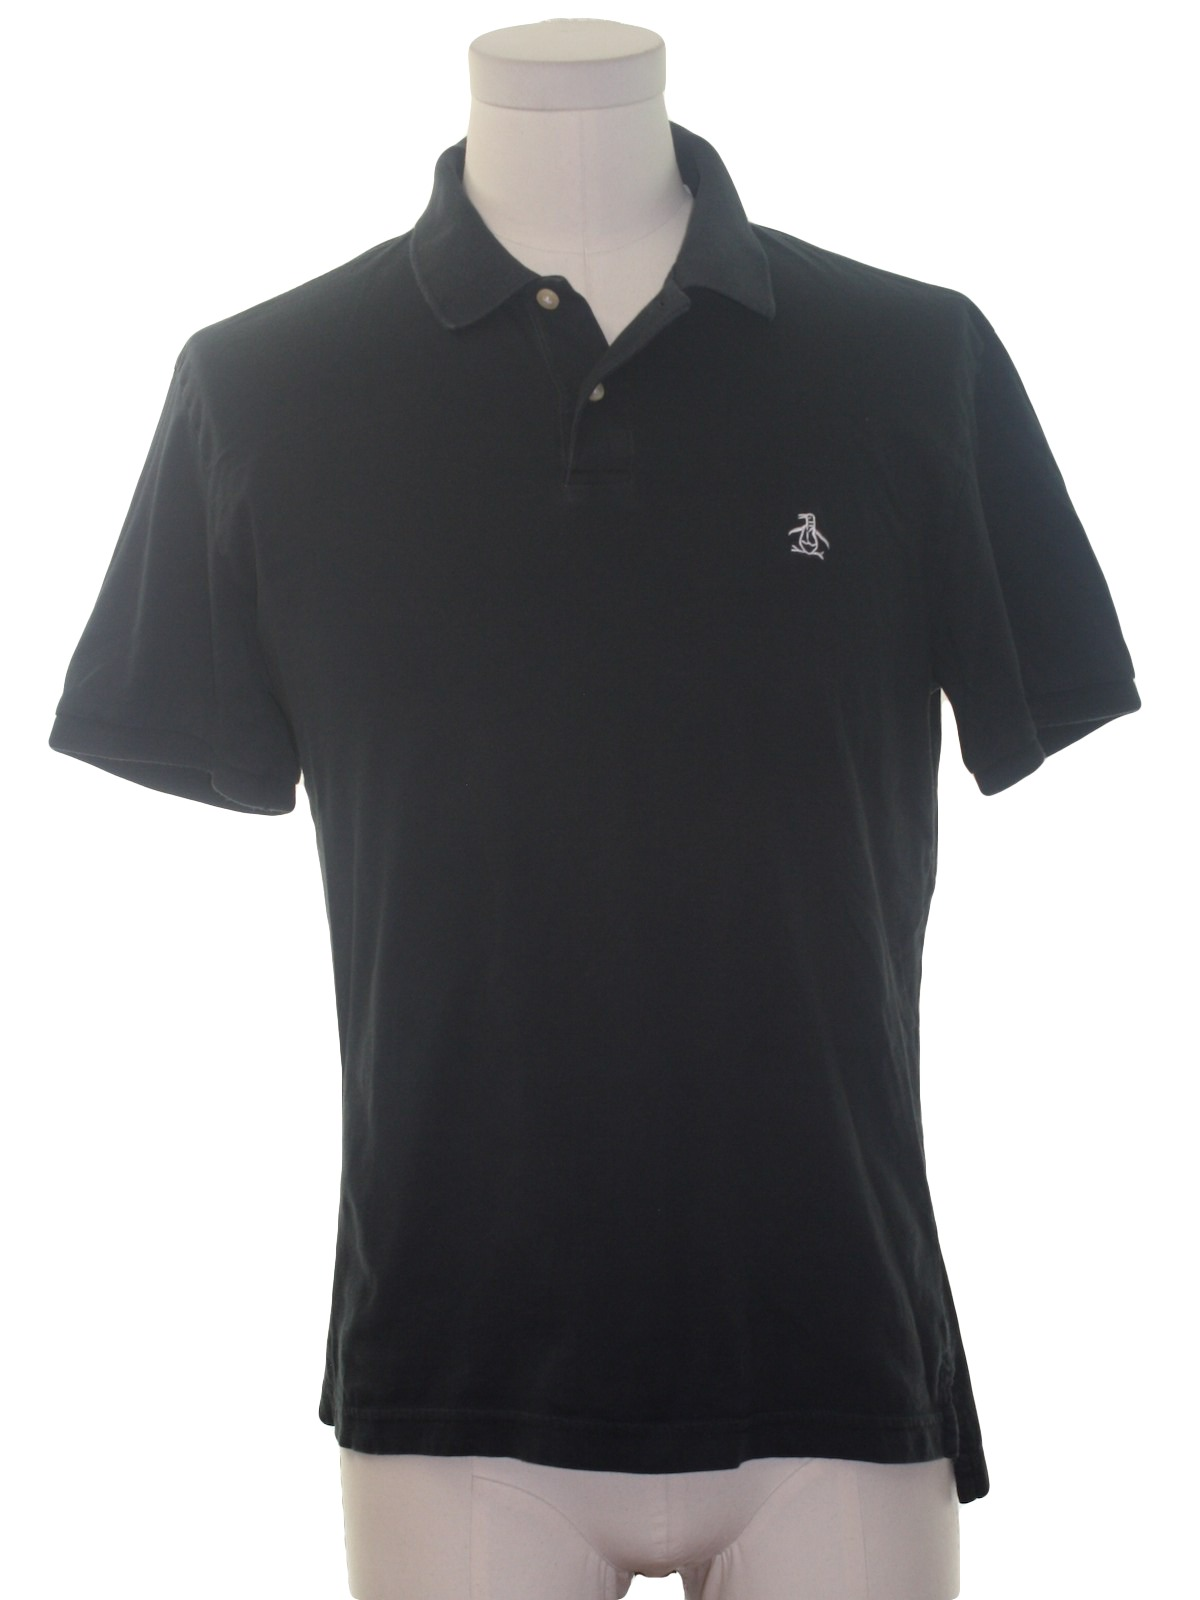 Shirt 90s penguin by munsingwear mens navy cotton short for Golf shirt with penguin logo